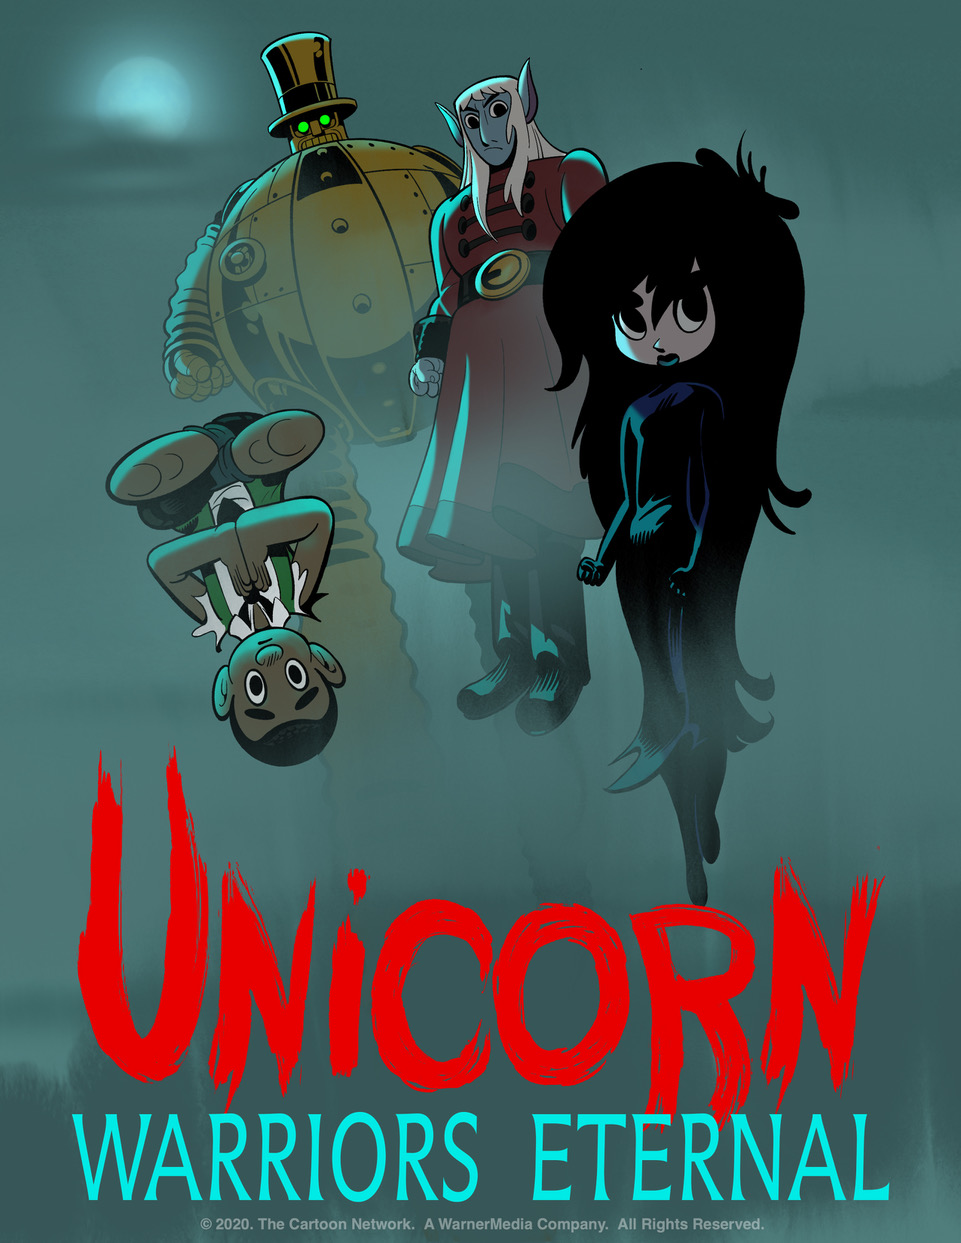 Unicorn - Warriors Eternal: La nueva serie animada de Genndy Tartakovsky